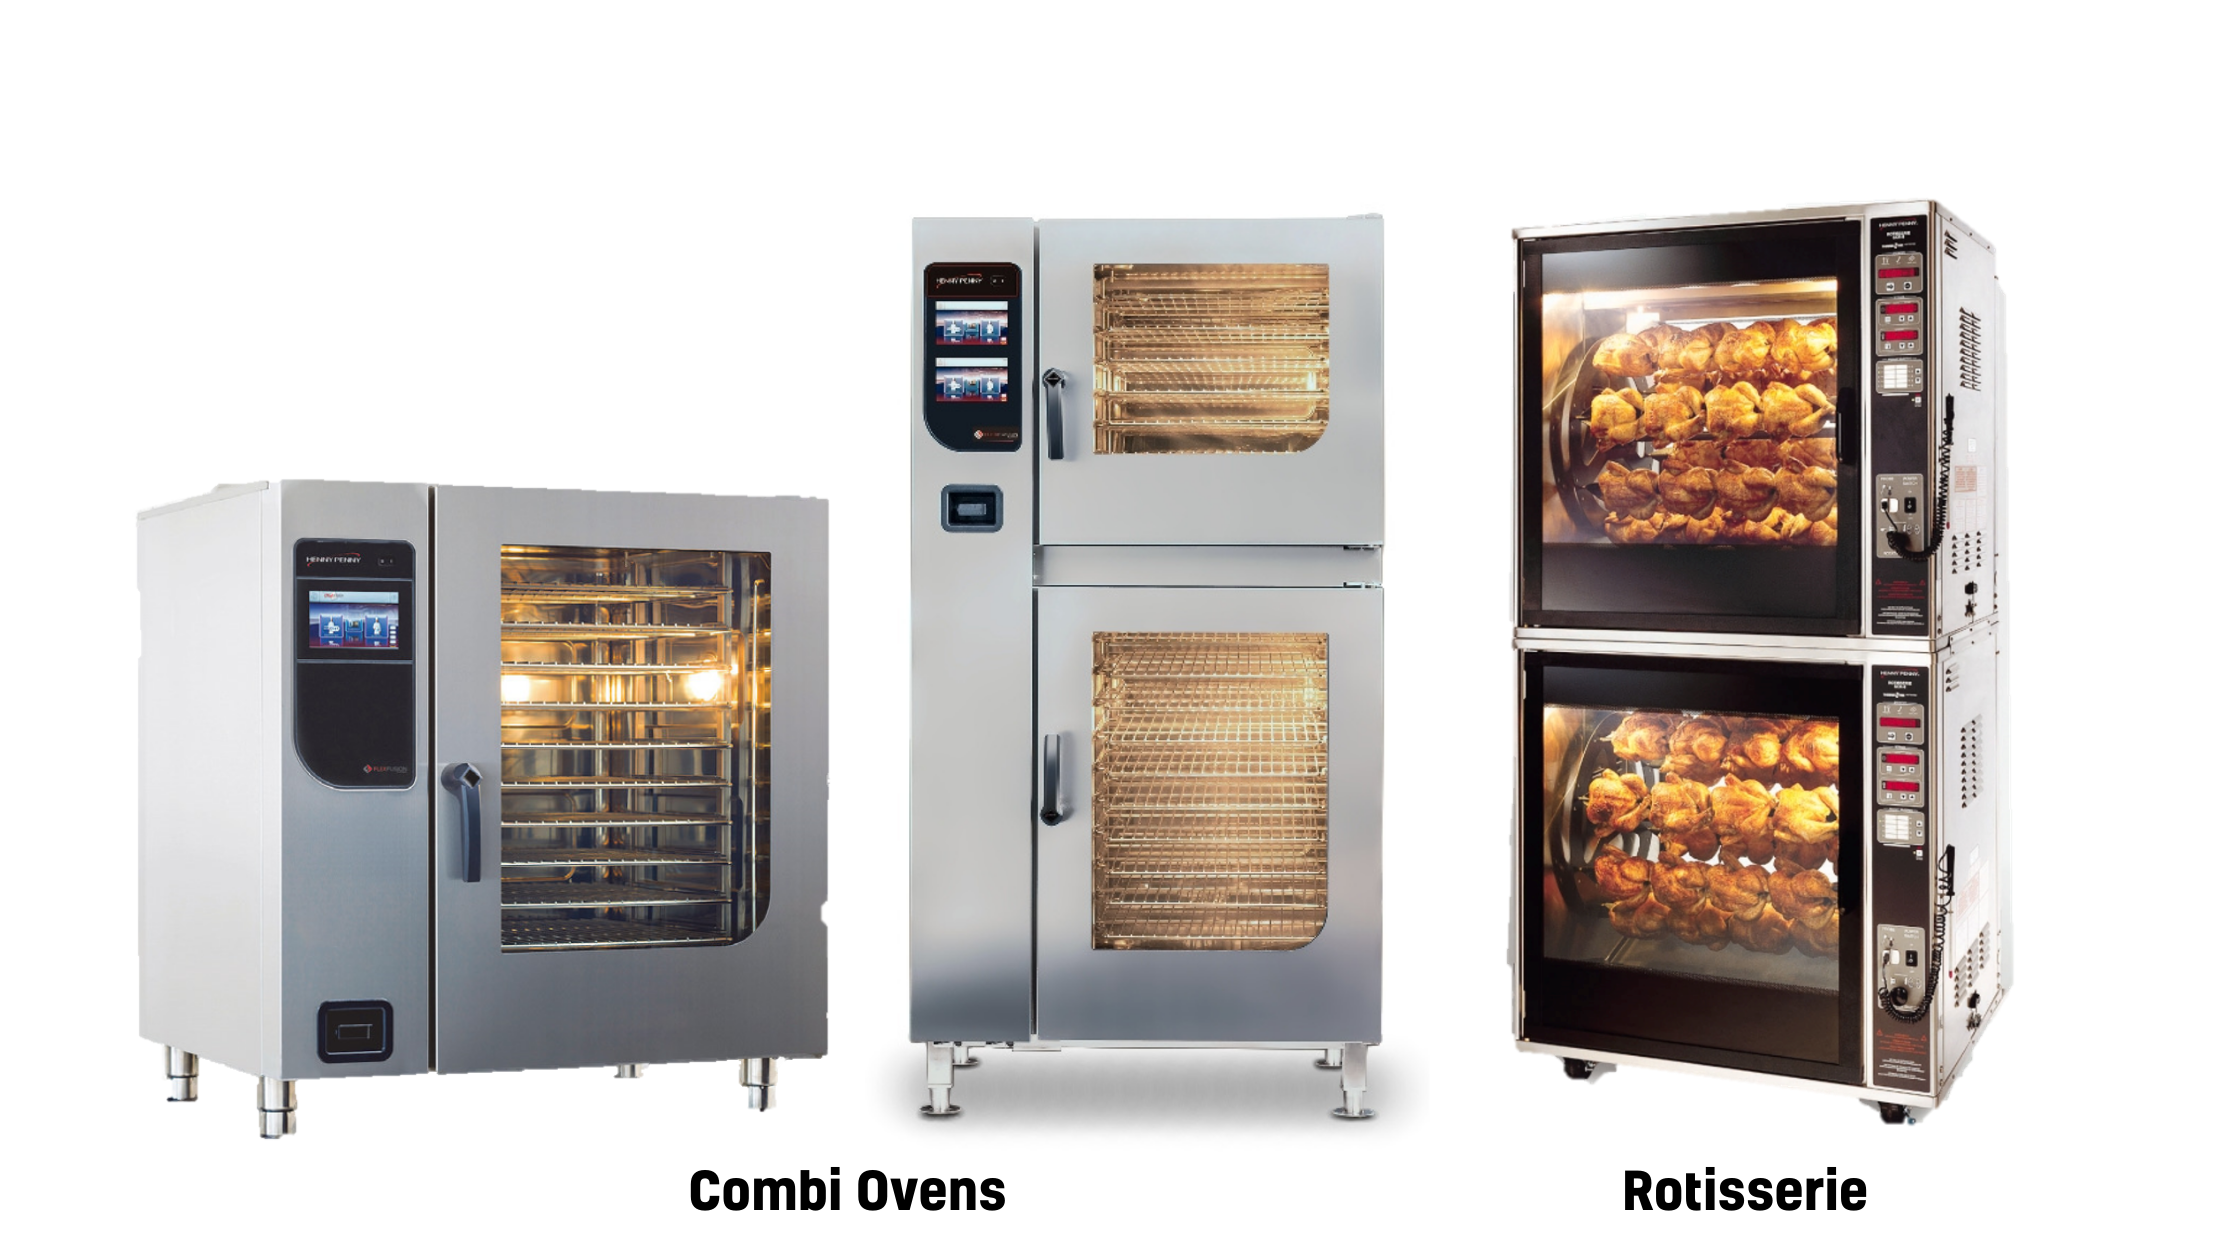 Henny Penny Combi Ovens & Rotisseries